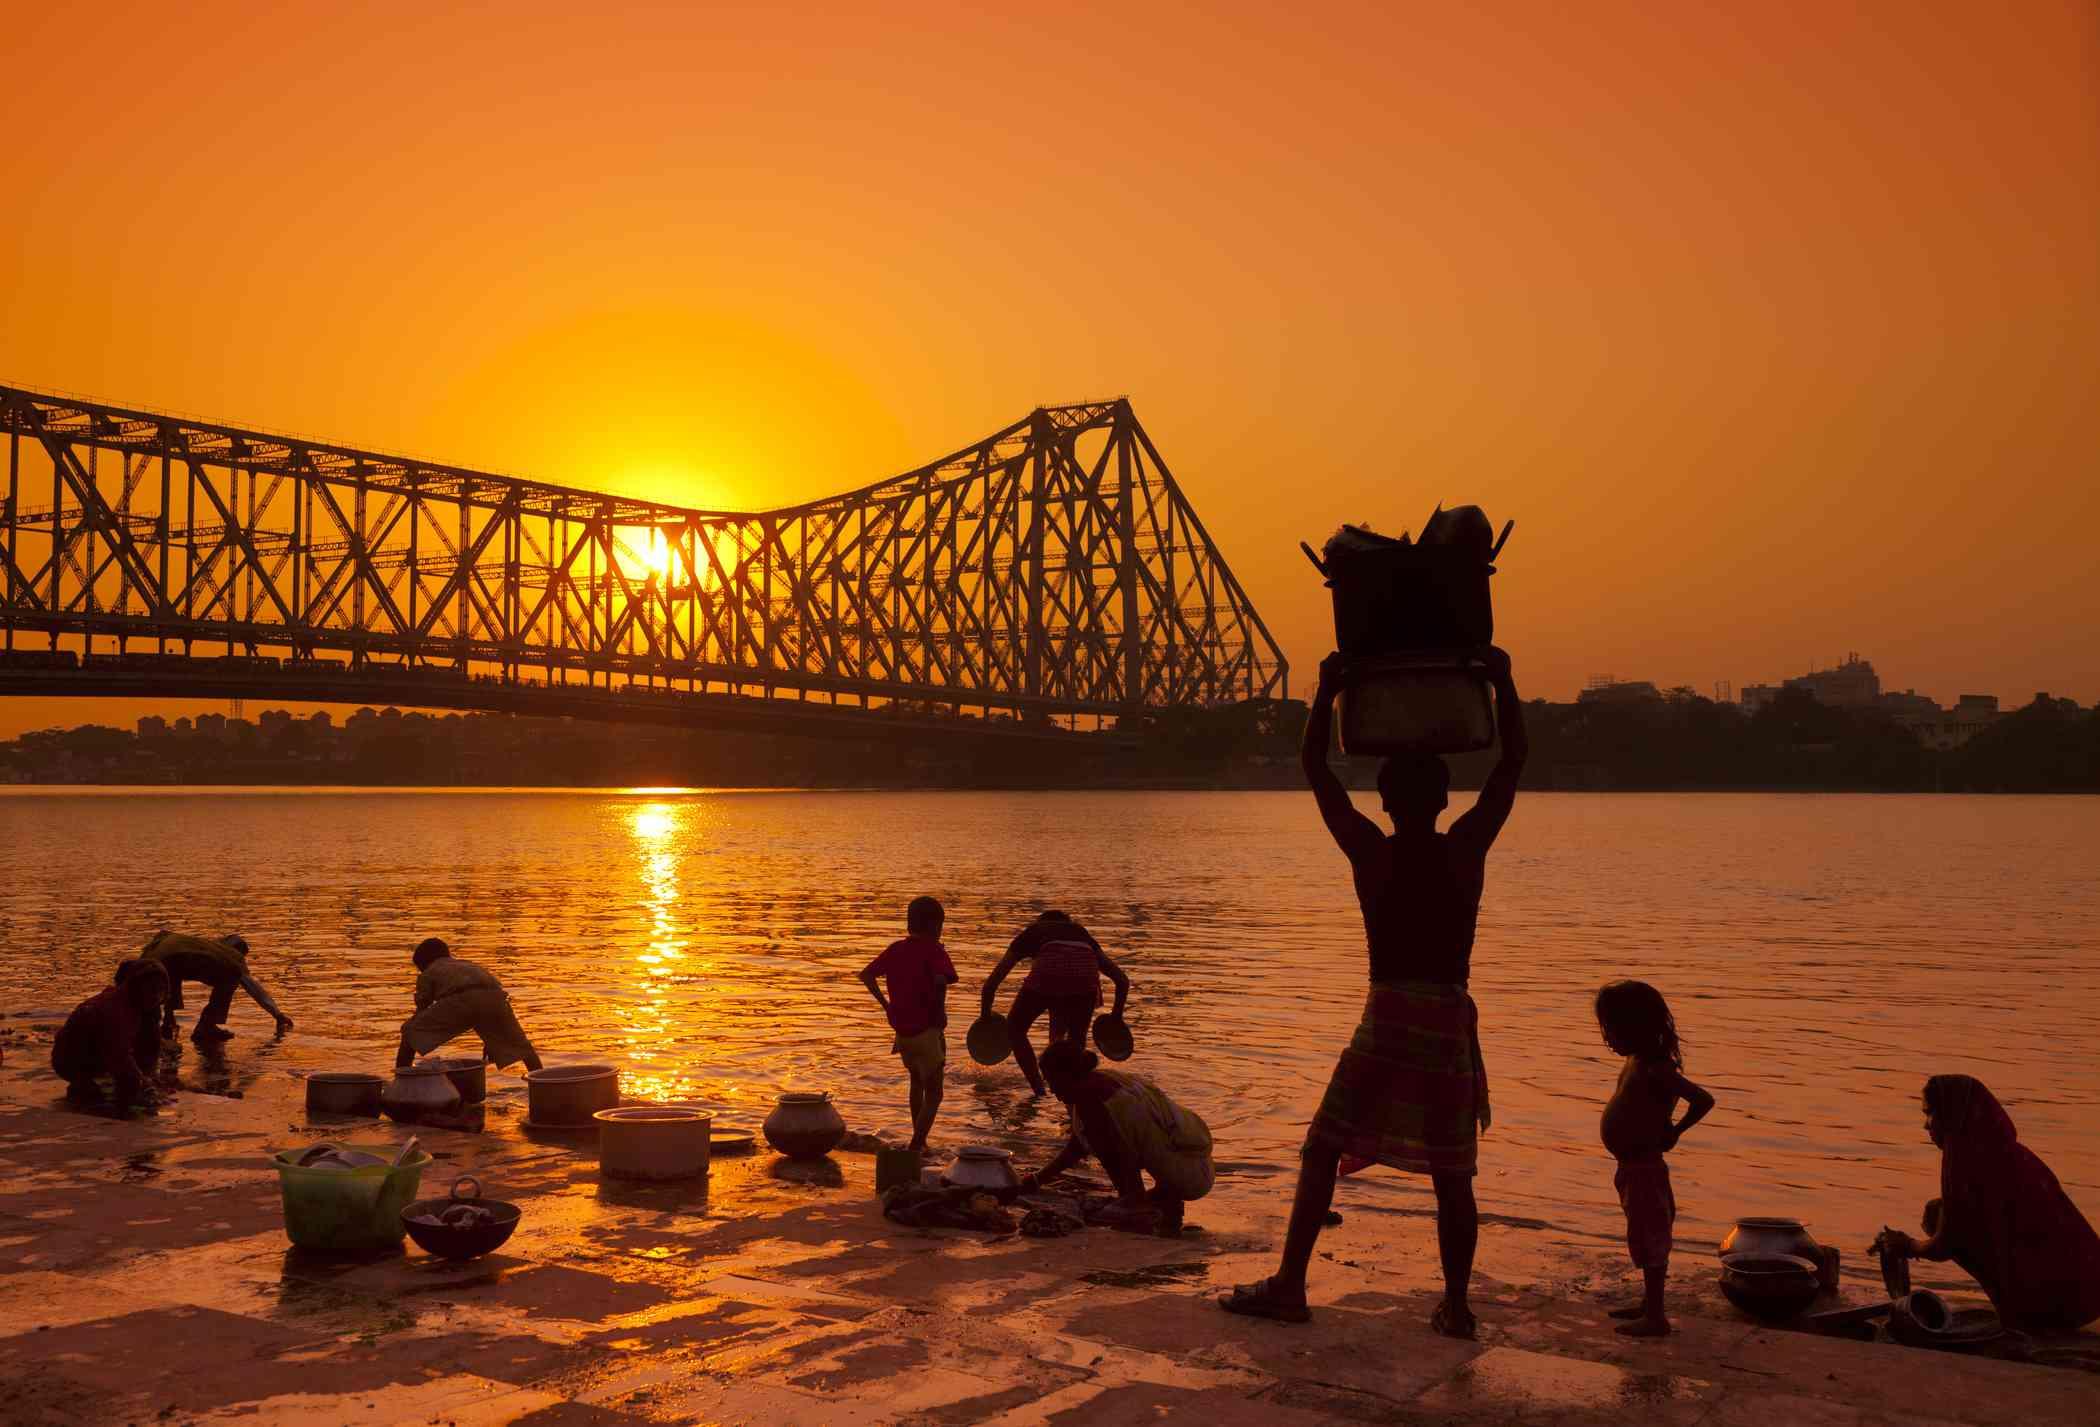 Familes washing in Hooghly River, Kolkata.